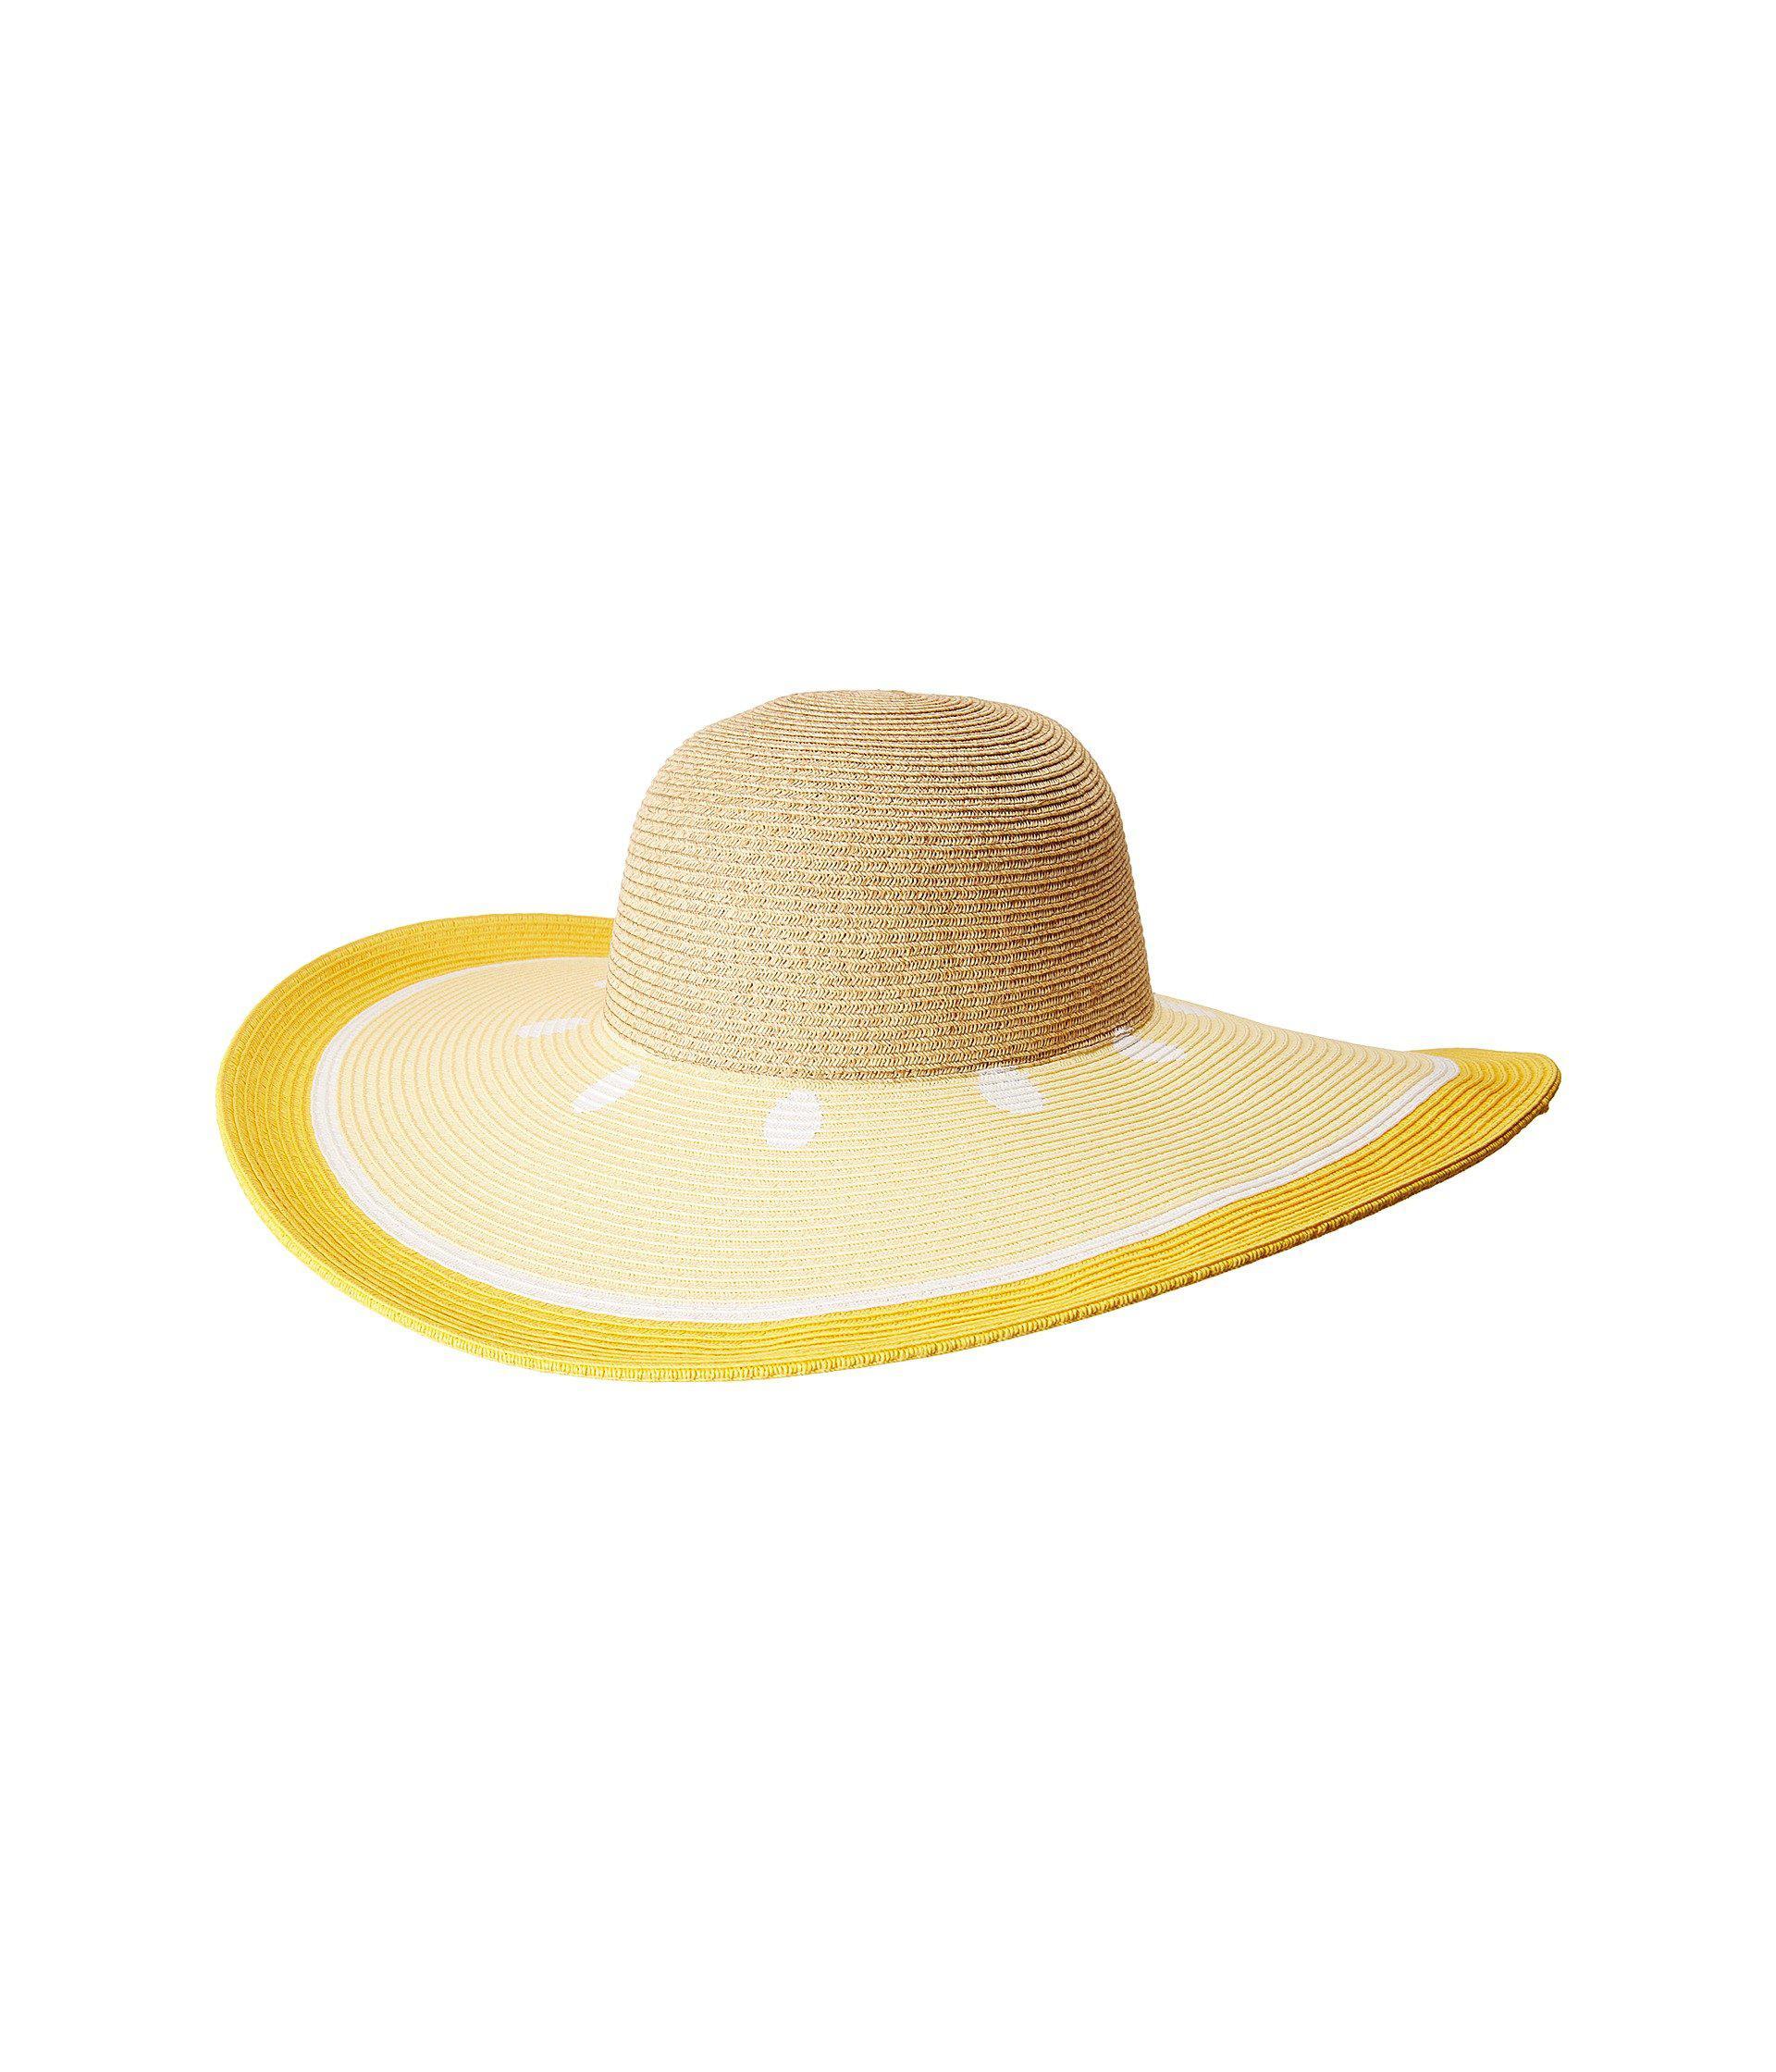 San Diego Hat Company. Women s Yellow Ubl6803 Ultrabraid Sun Brim Fruit  (orange) Caps 210ed5ae9c10